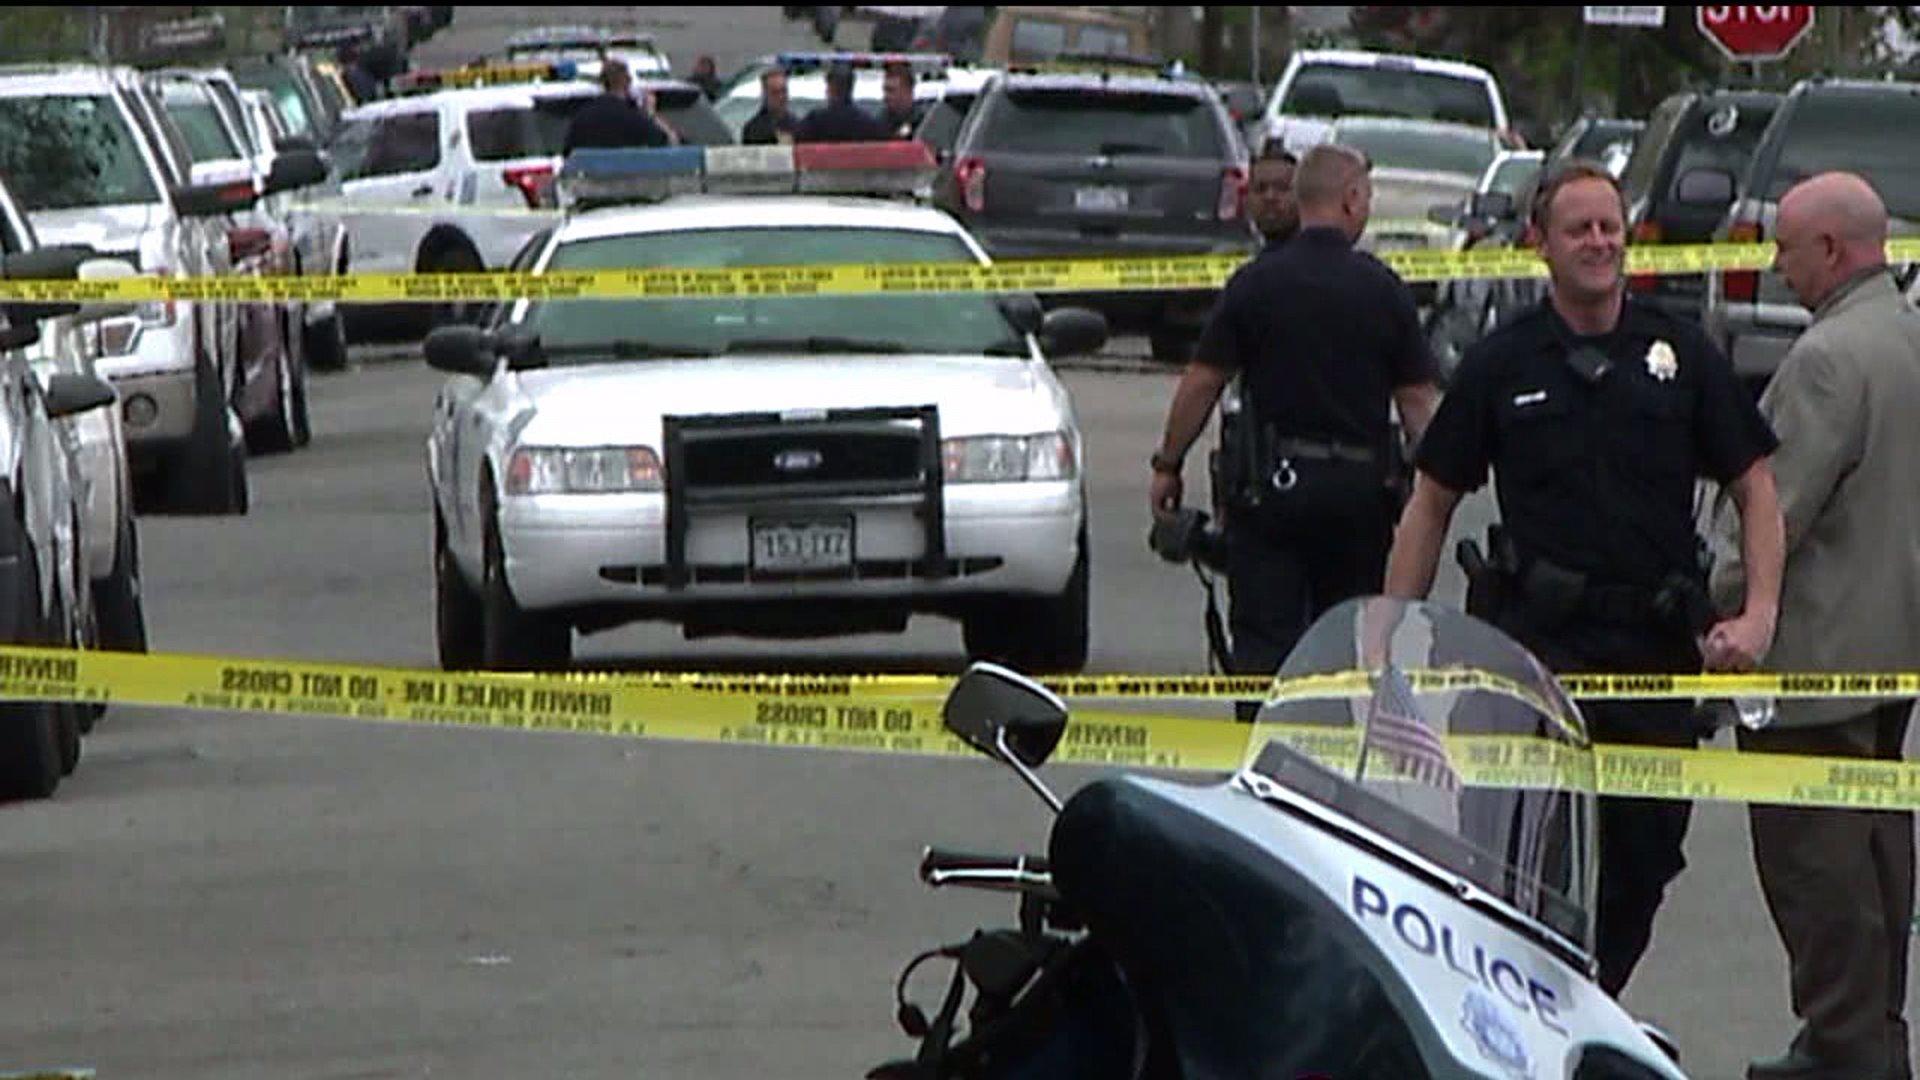 32nd and Gilpin shooting, April 25, 2015